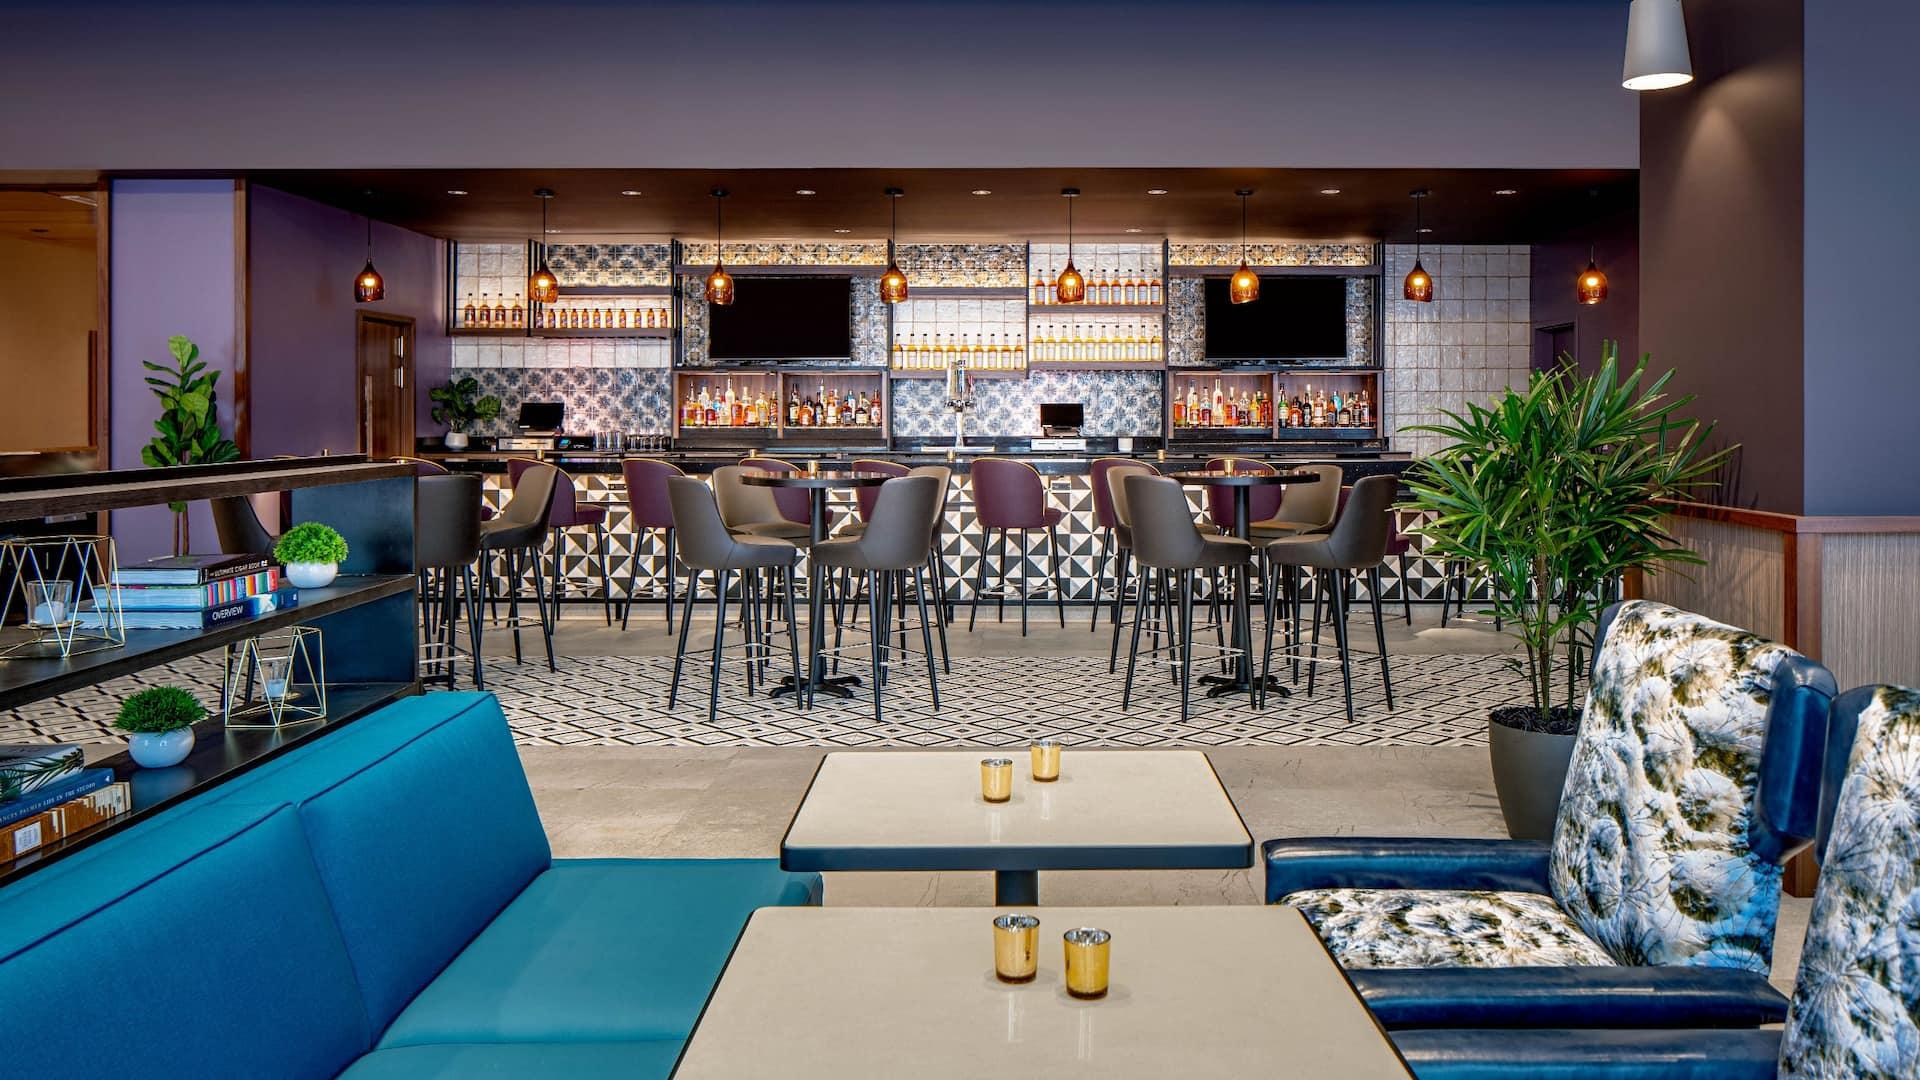 Corazon Bar & Restaurant